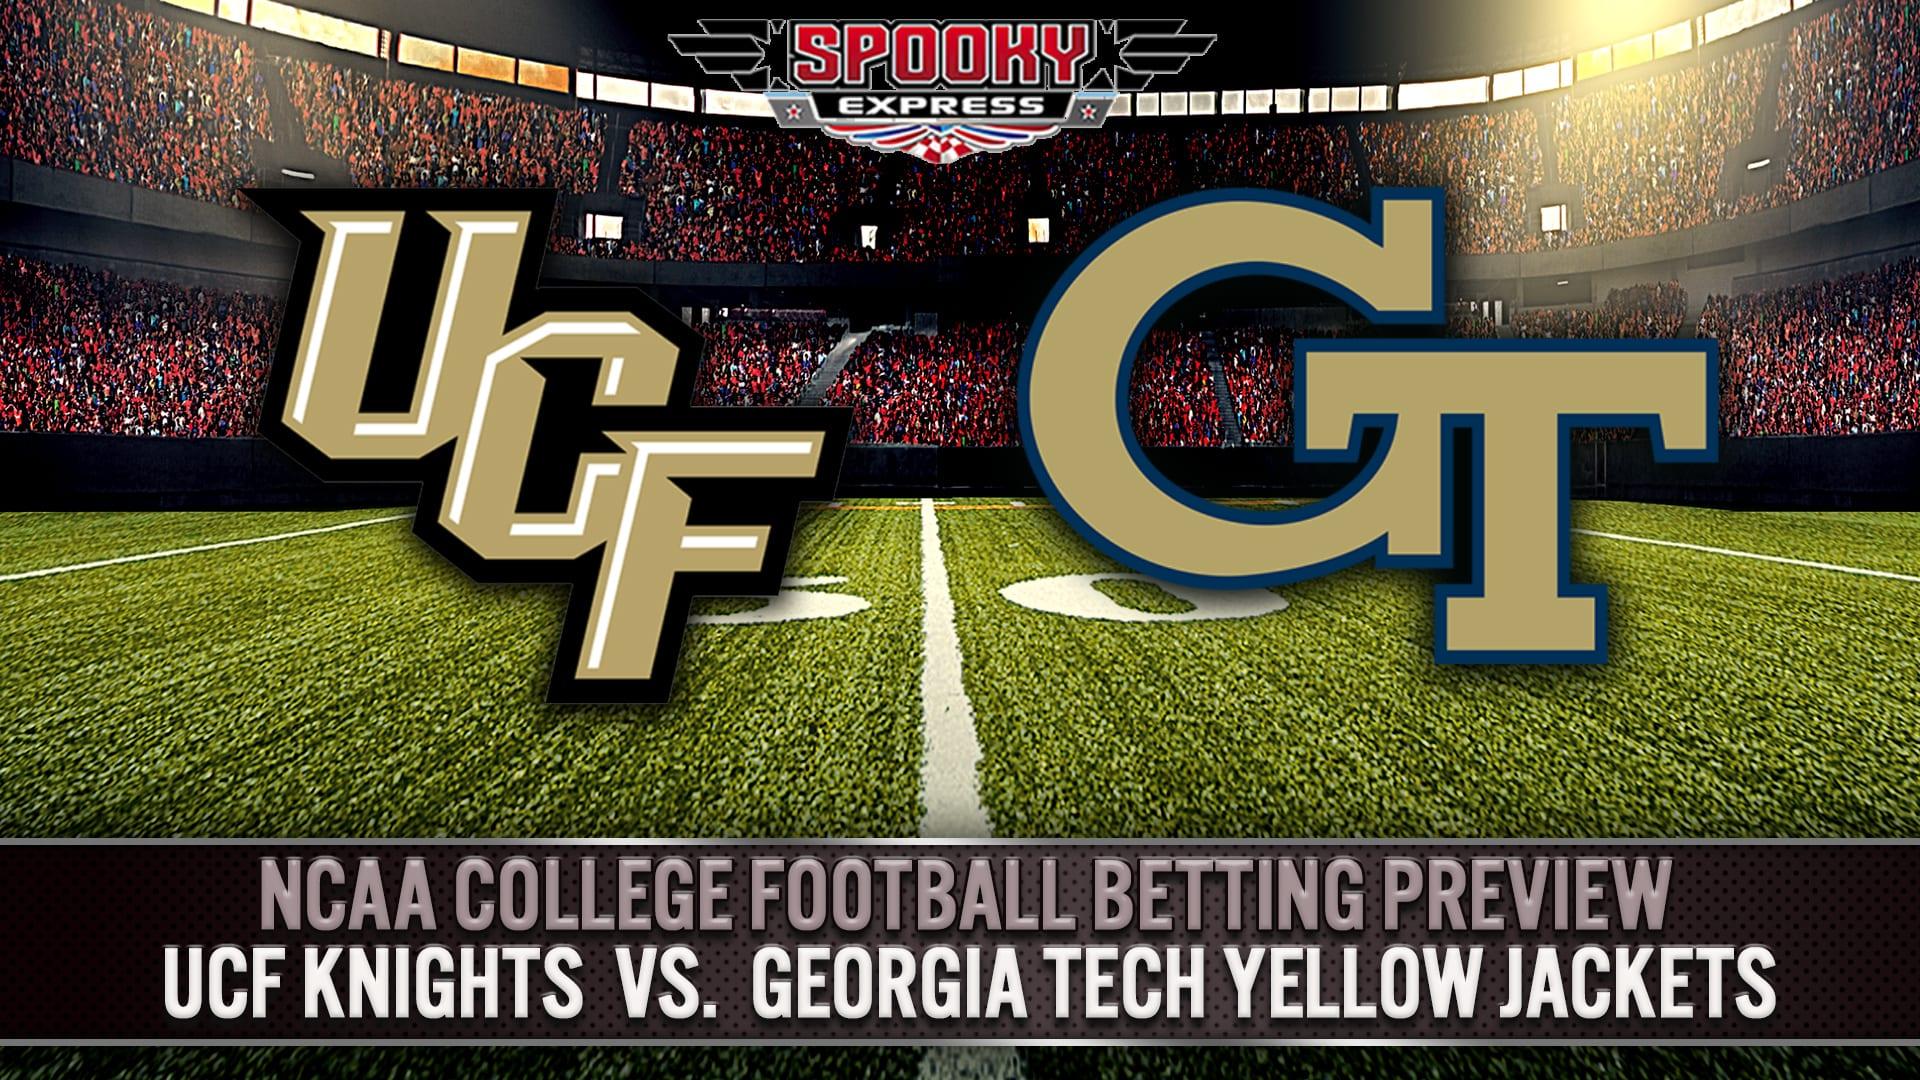 Ncaa College Football Betting Preview Ucf Vs Georgia Tech